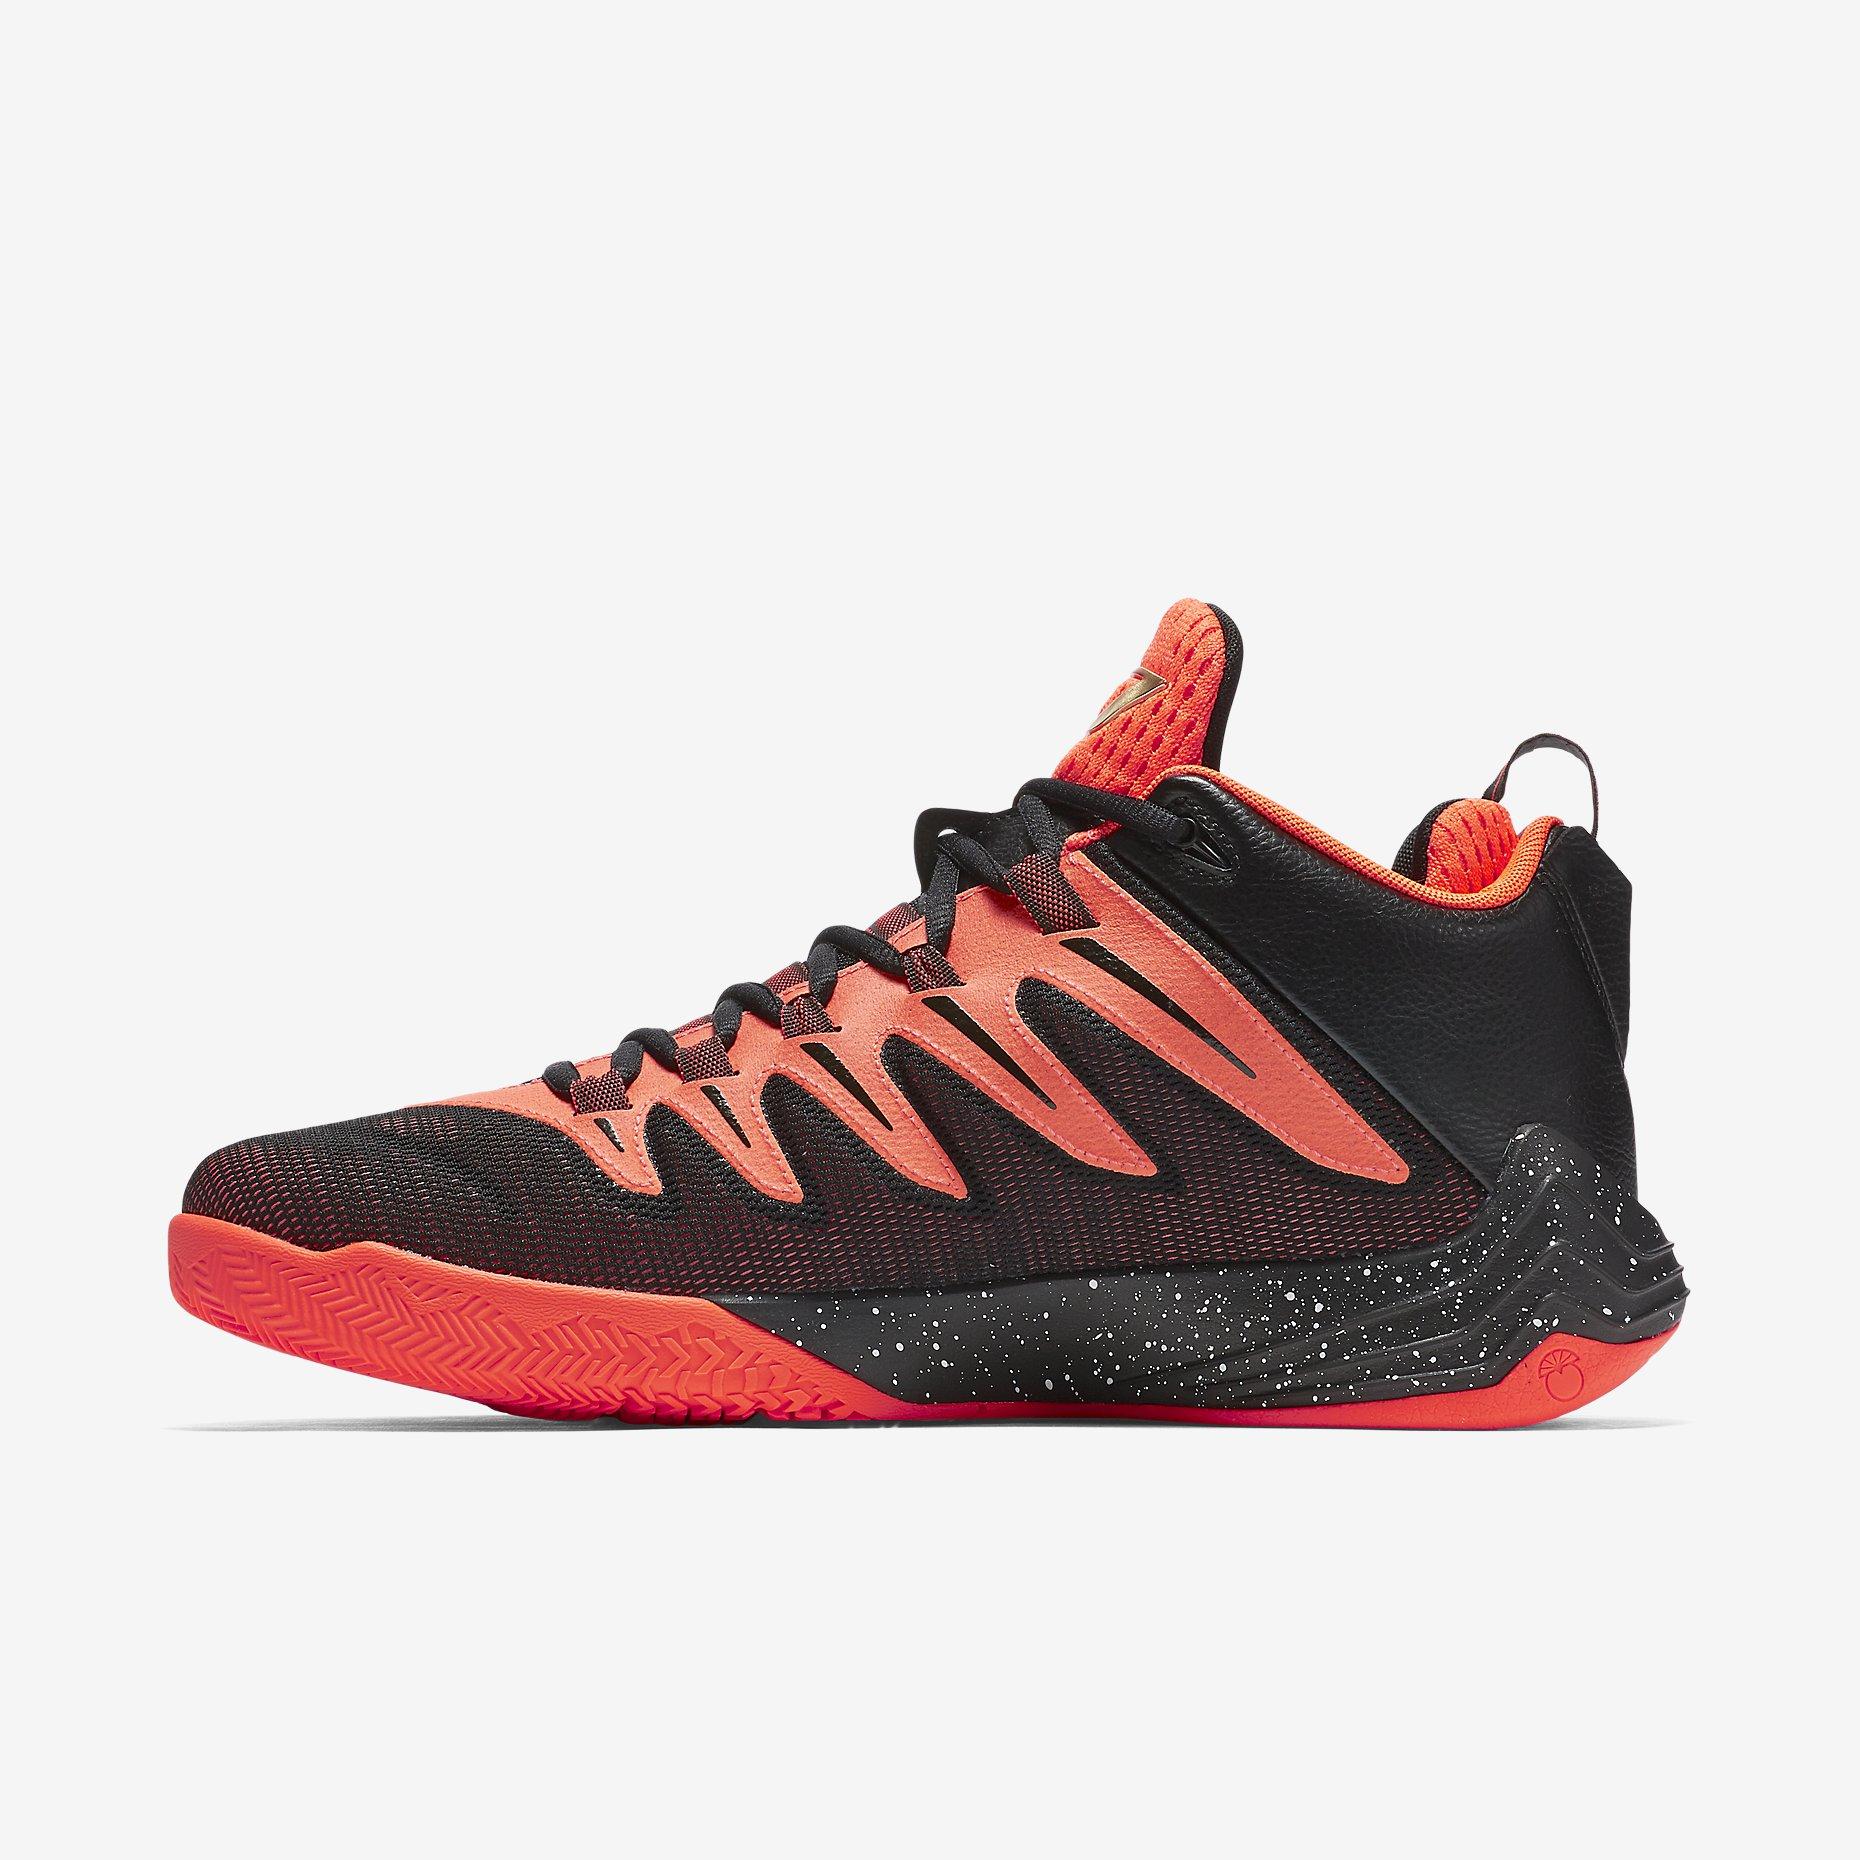 aae7e1bfb941db Get Quotations · Nike nike men s shoes jordan CP3.IX x jordan men s basketball  shoes 829217-003